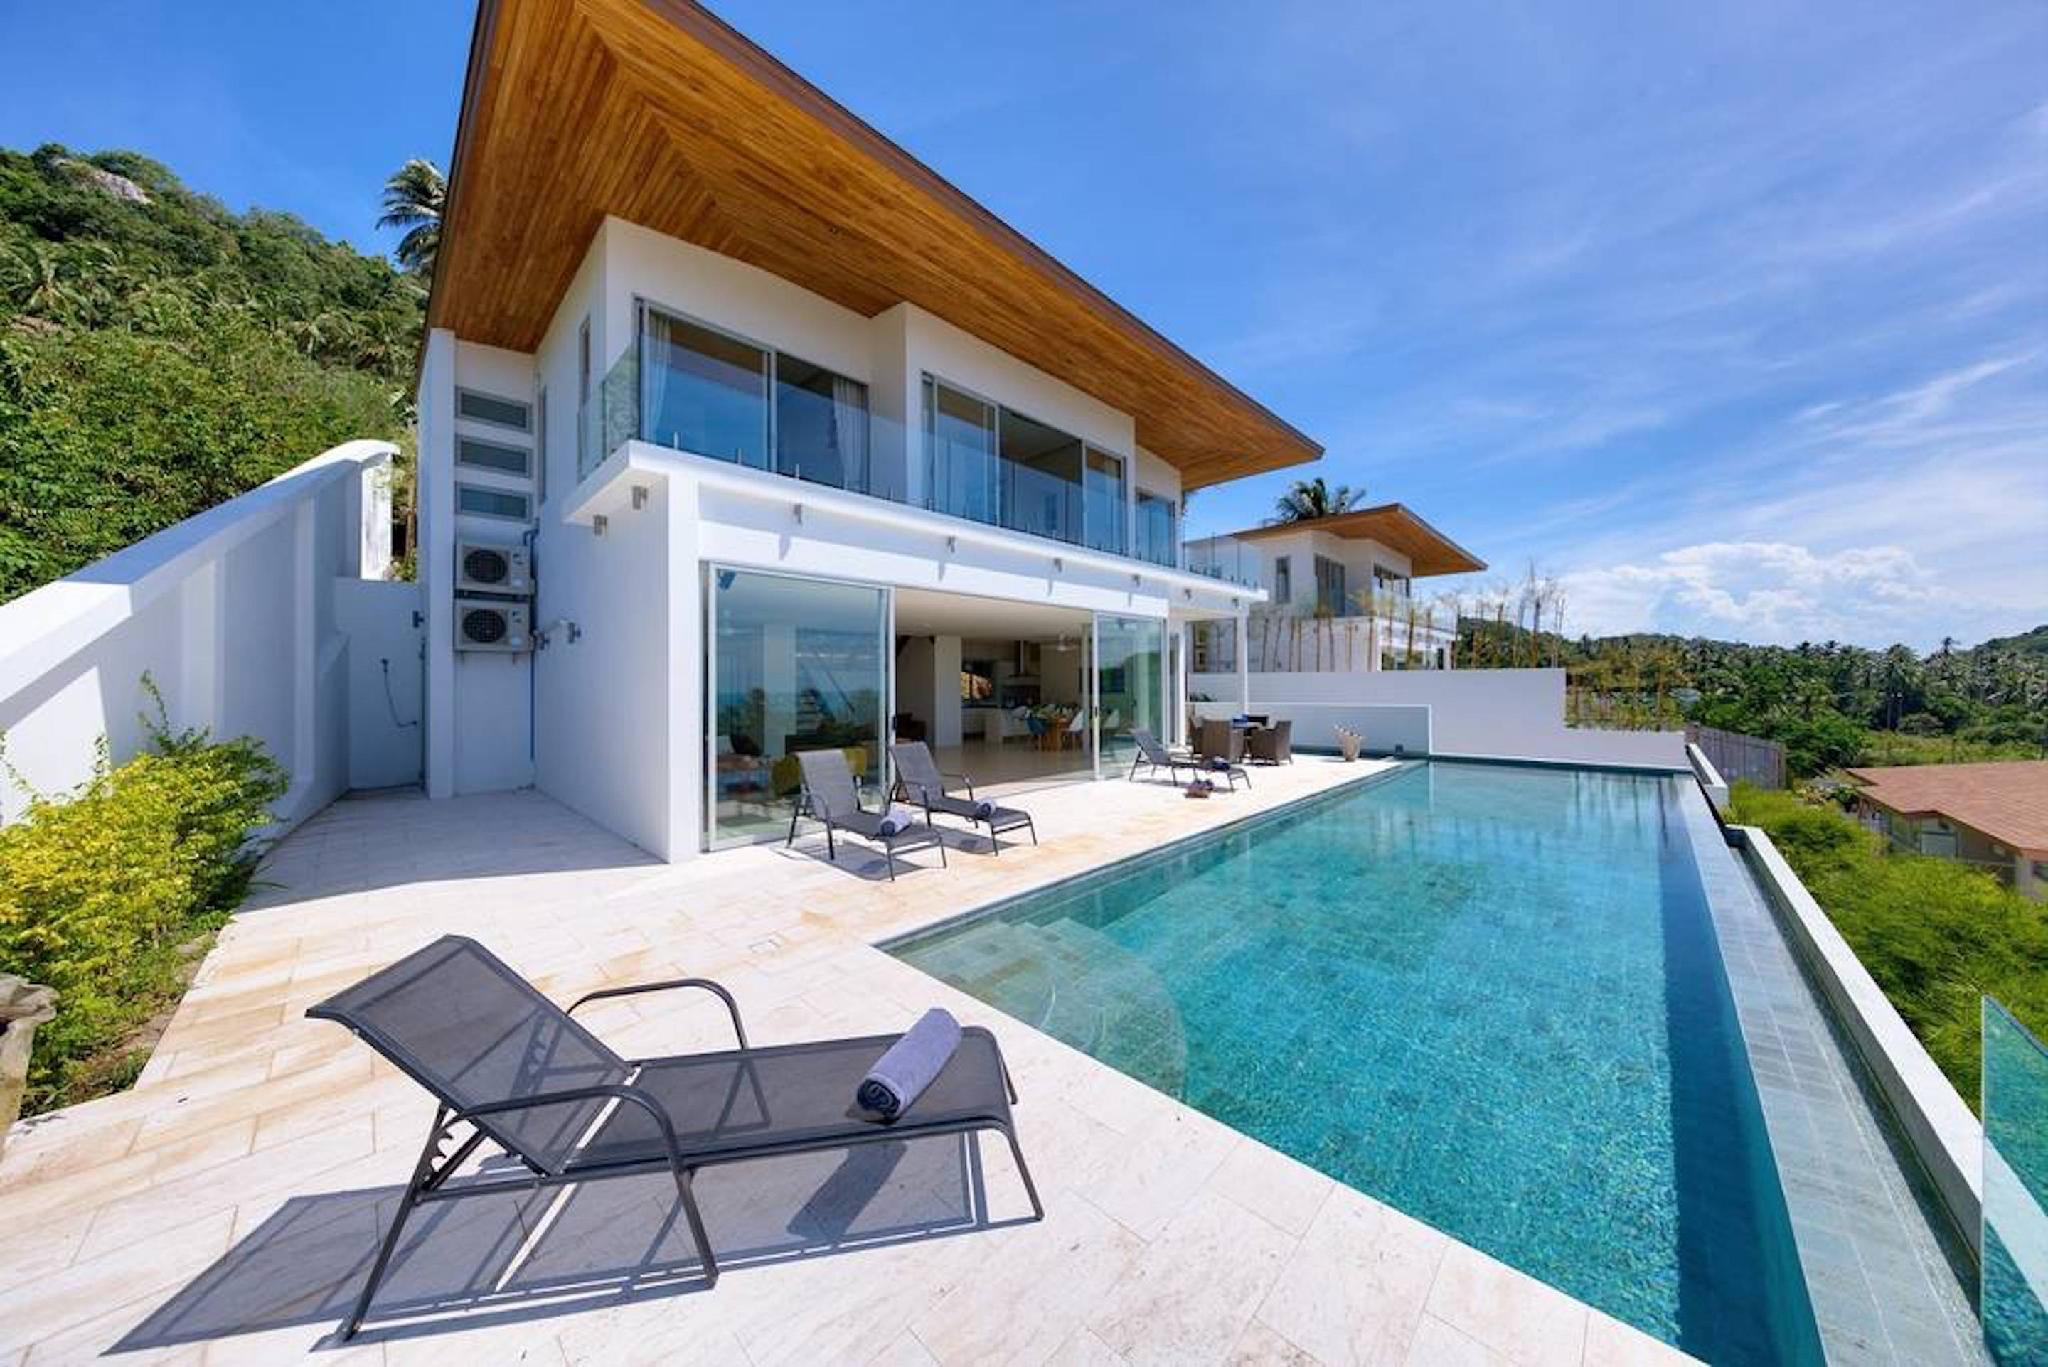 6 Bedroom Luxury Seaview Villa Asti - Bang Por 6 Bedroom Luxury Seaview Villa Asti - Bang Por